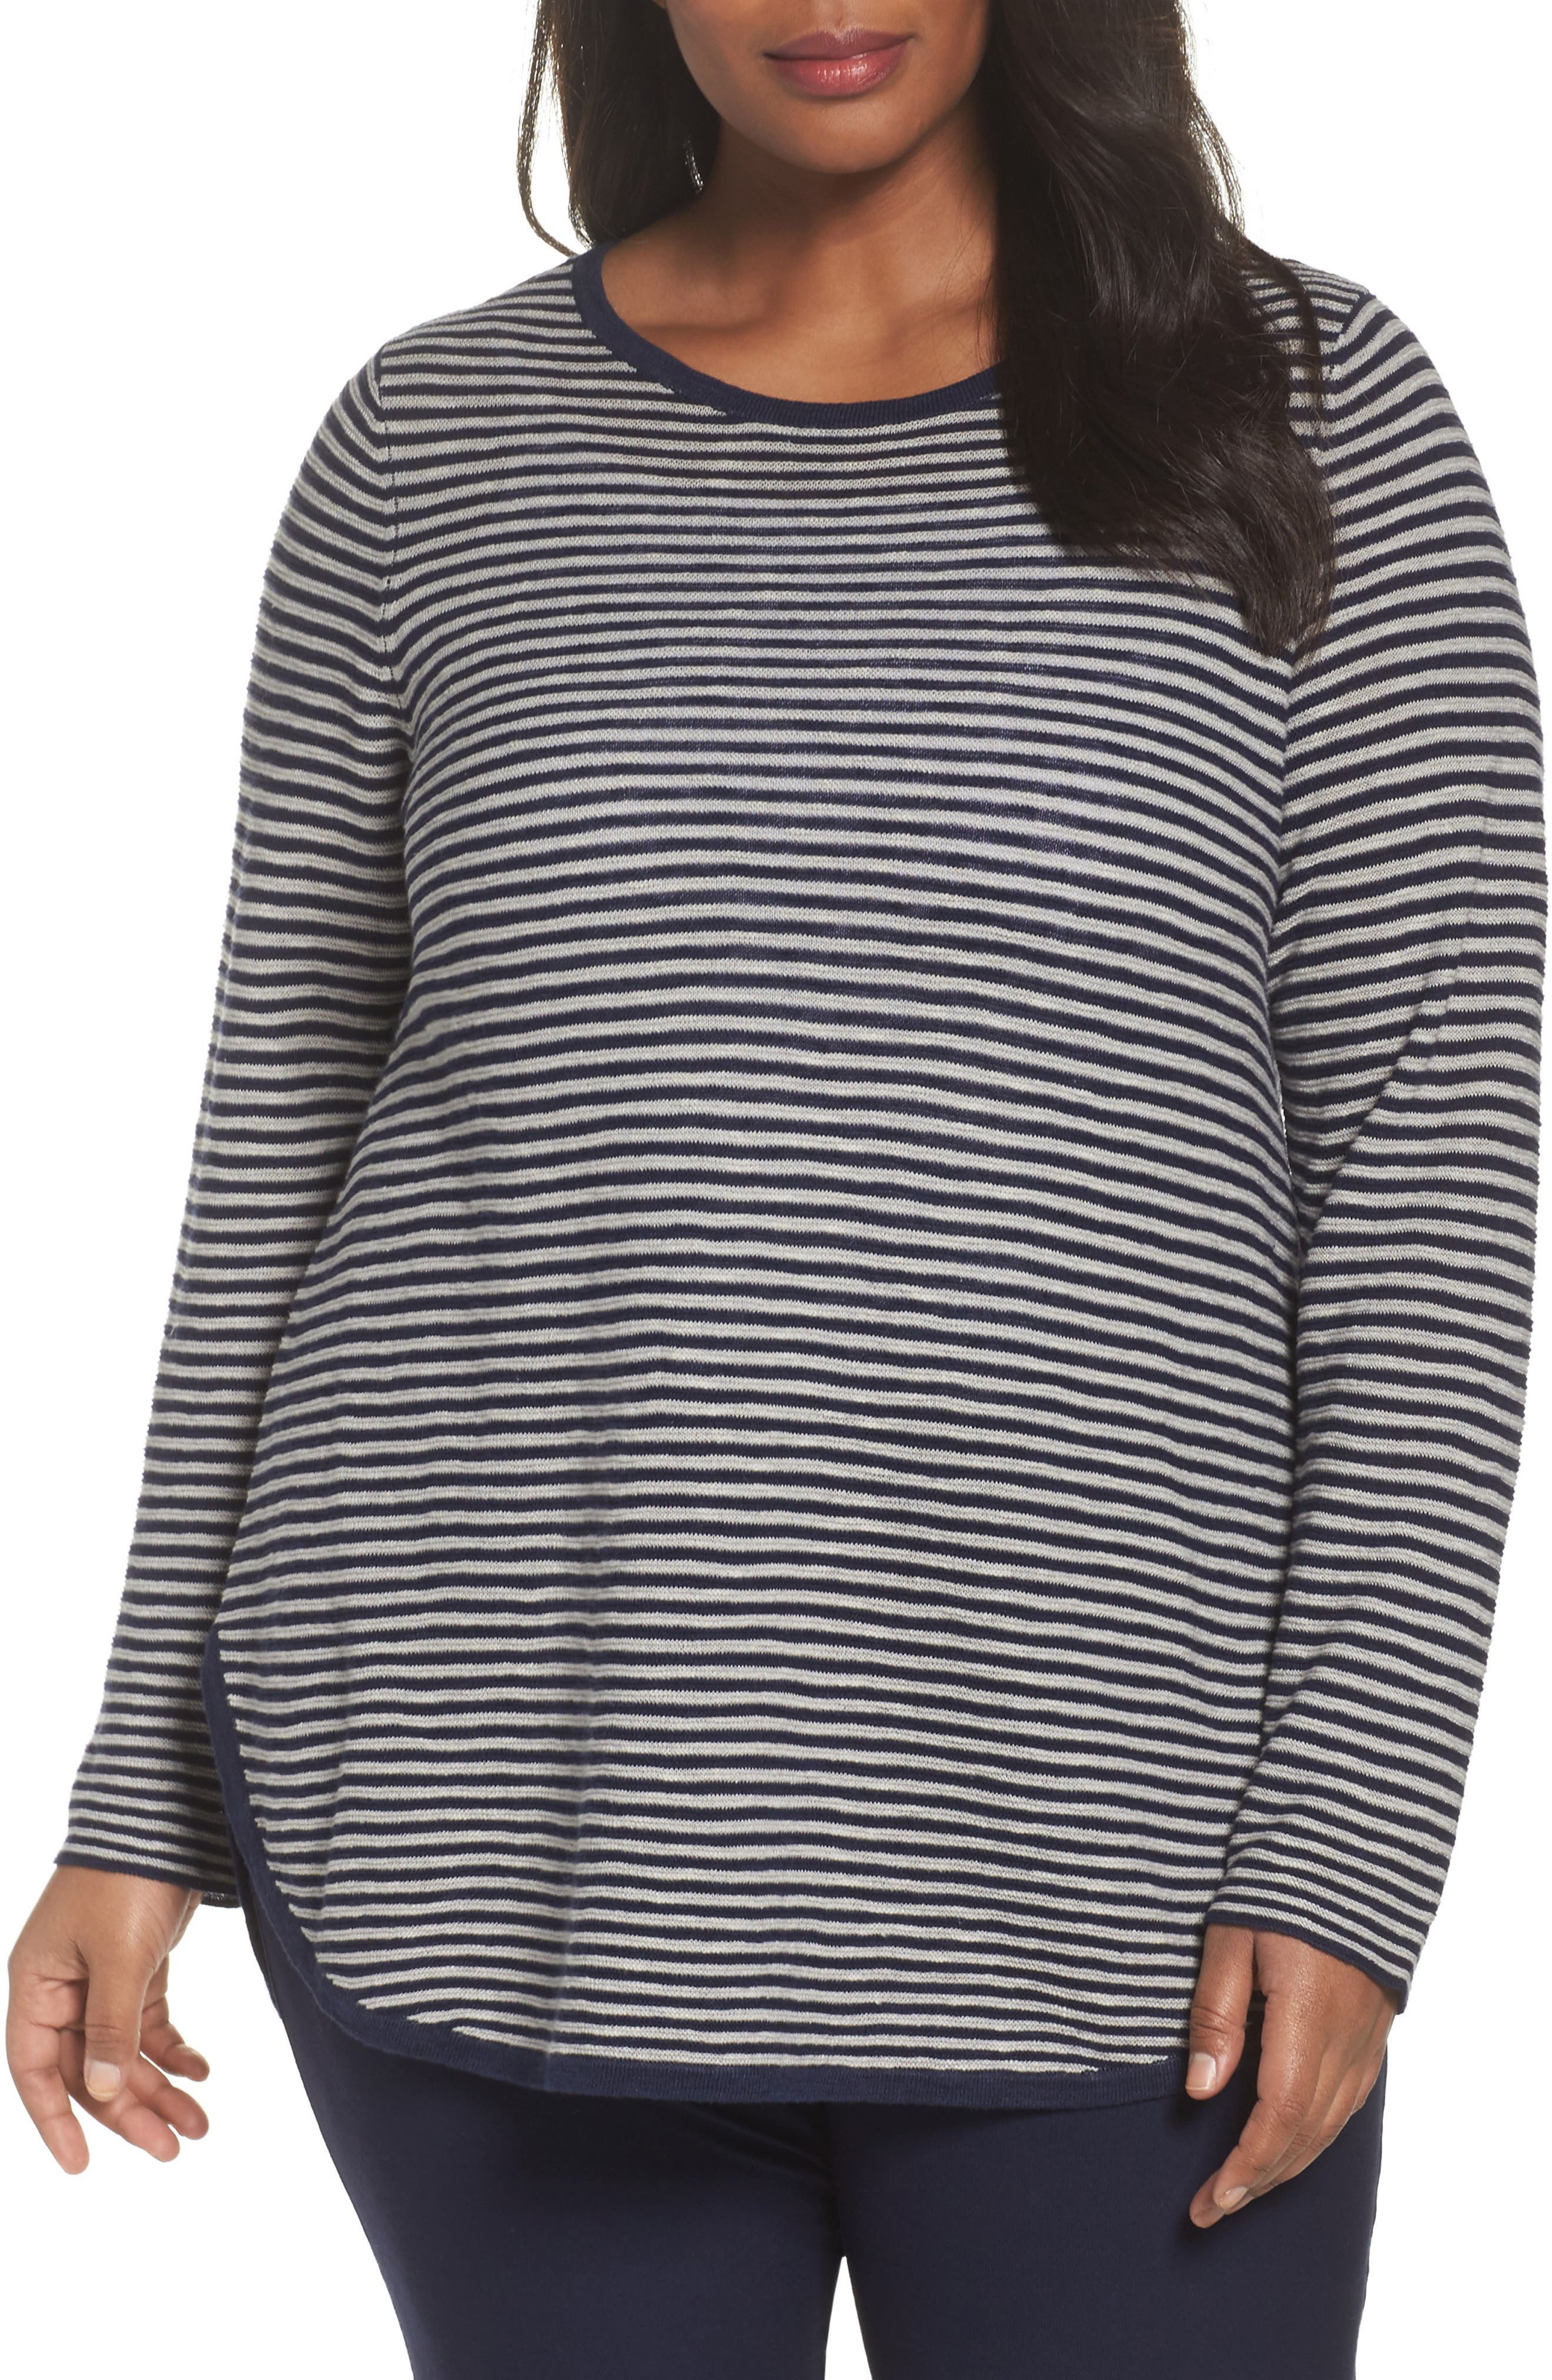 Alternate Image 1 Selected - Eileen Fisher Stripe Organic Linen & Cotton Sweater (Plus Size)